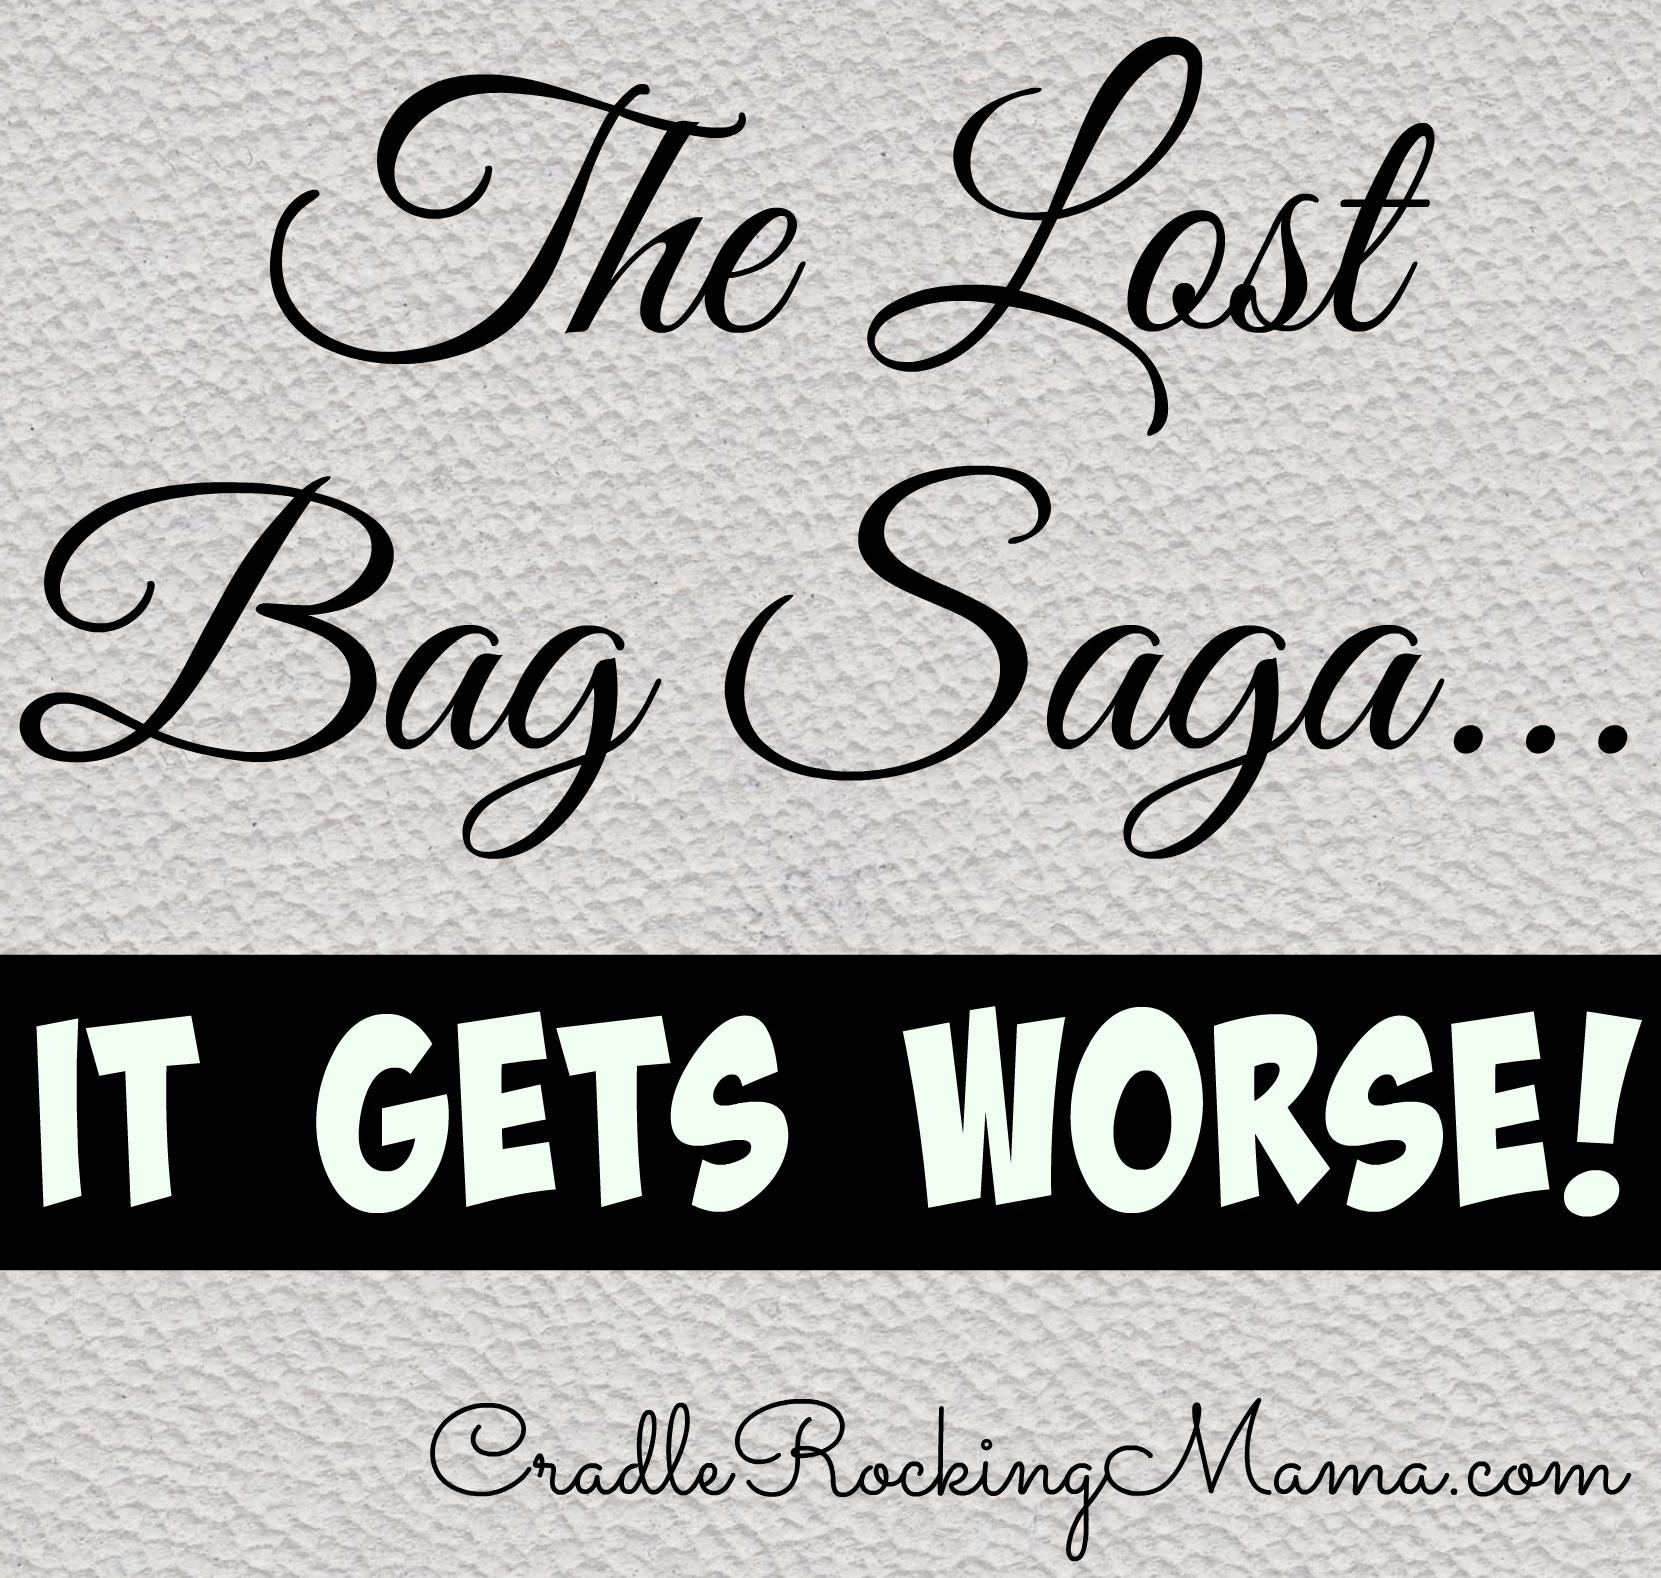 The Lost Bag Saga It Gets Worse CradleRockingMama.com